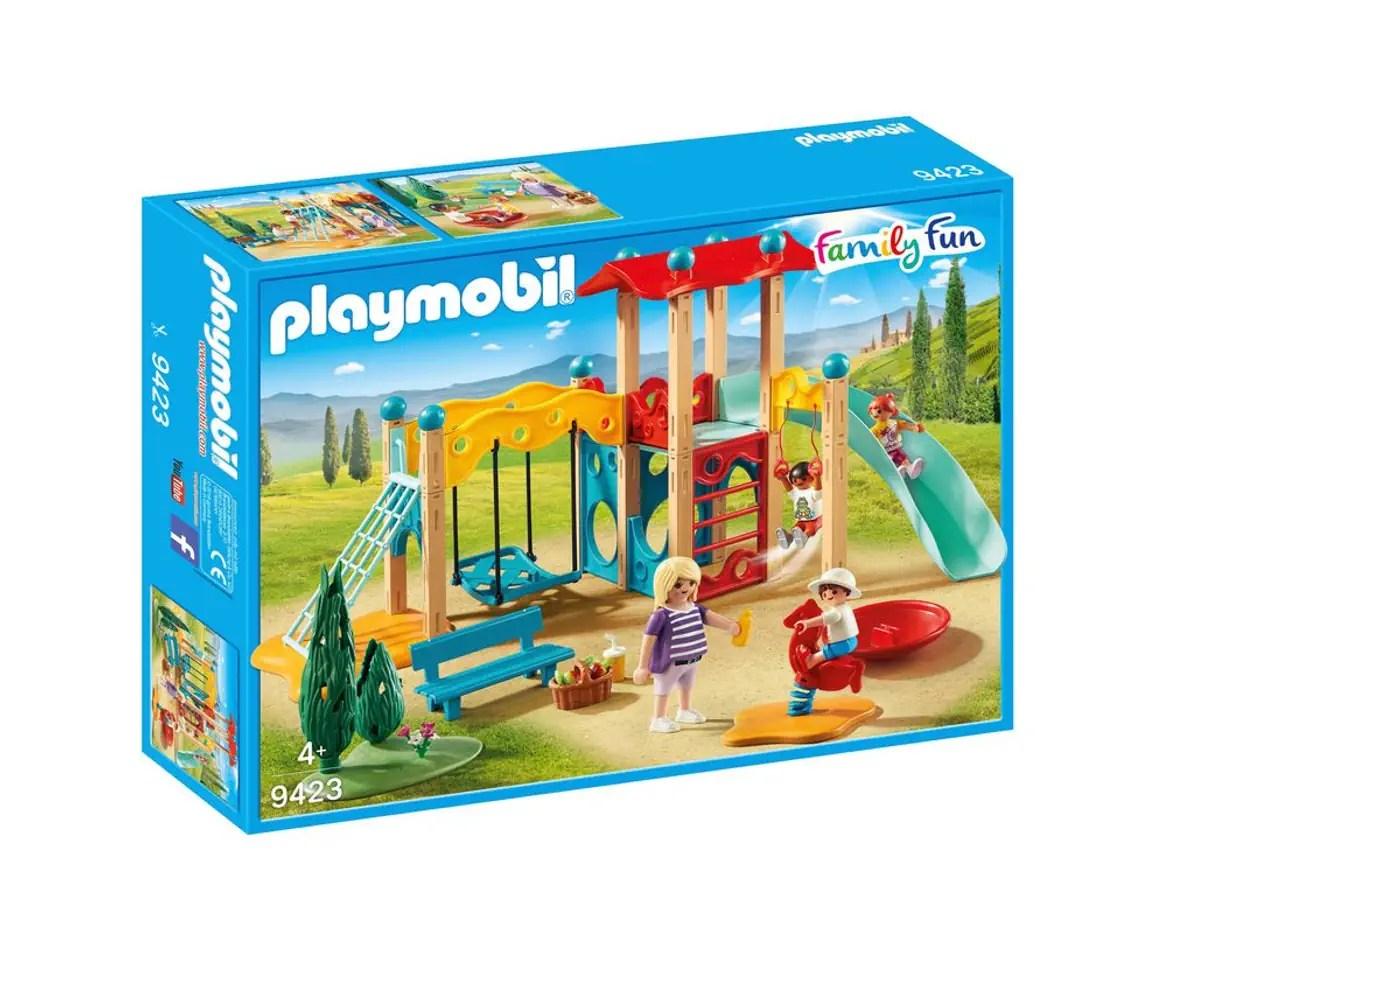 Playmobil Klettergerüst : Kletternetz kinderzimmer playmobil grosser spielplatz migros